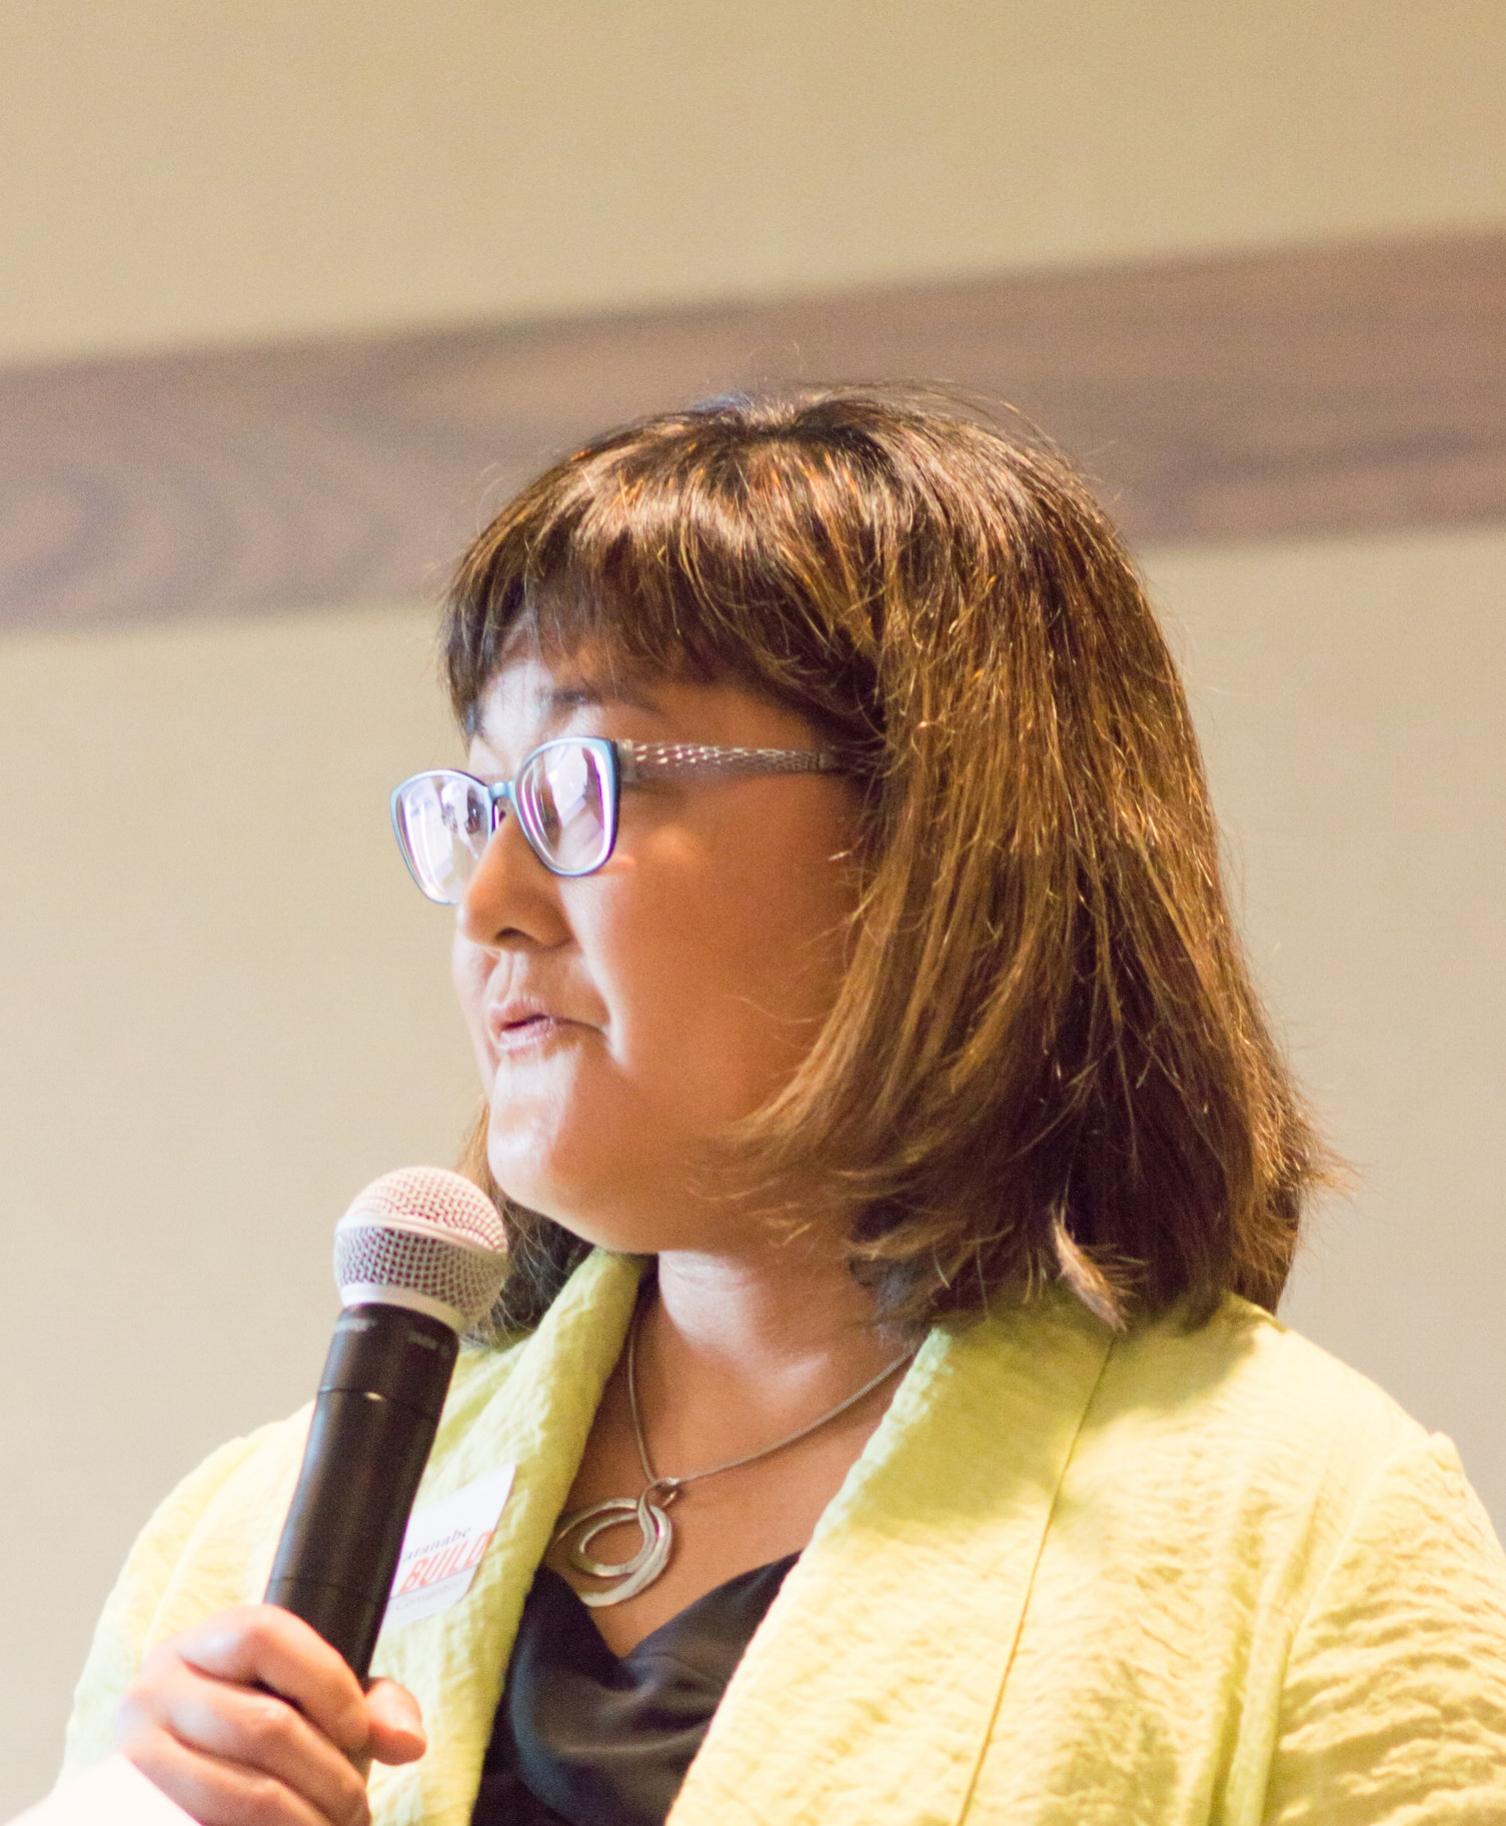 - Women in Leadership Ms. Mari Watanabe